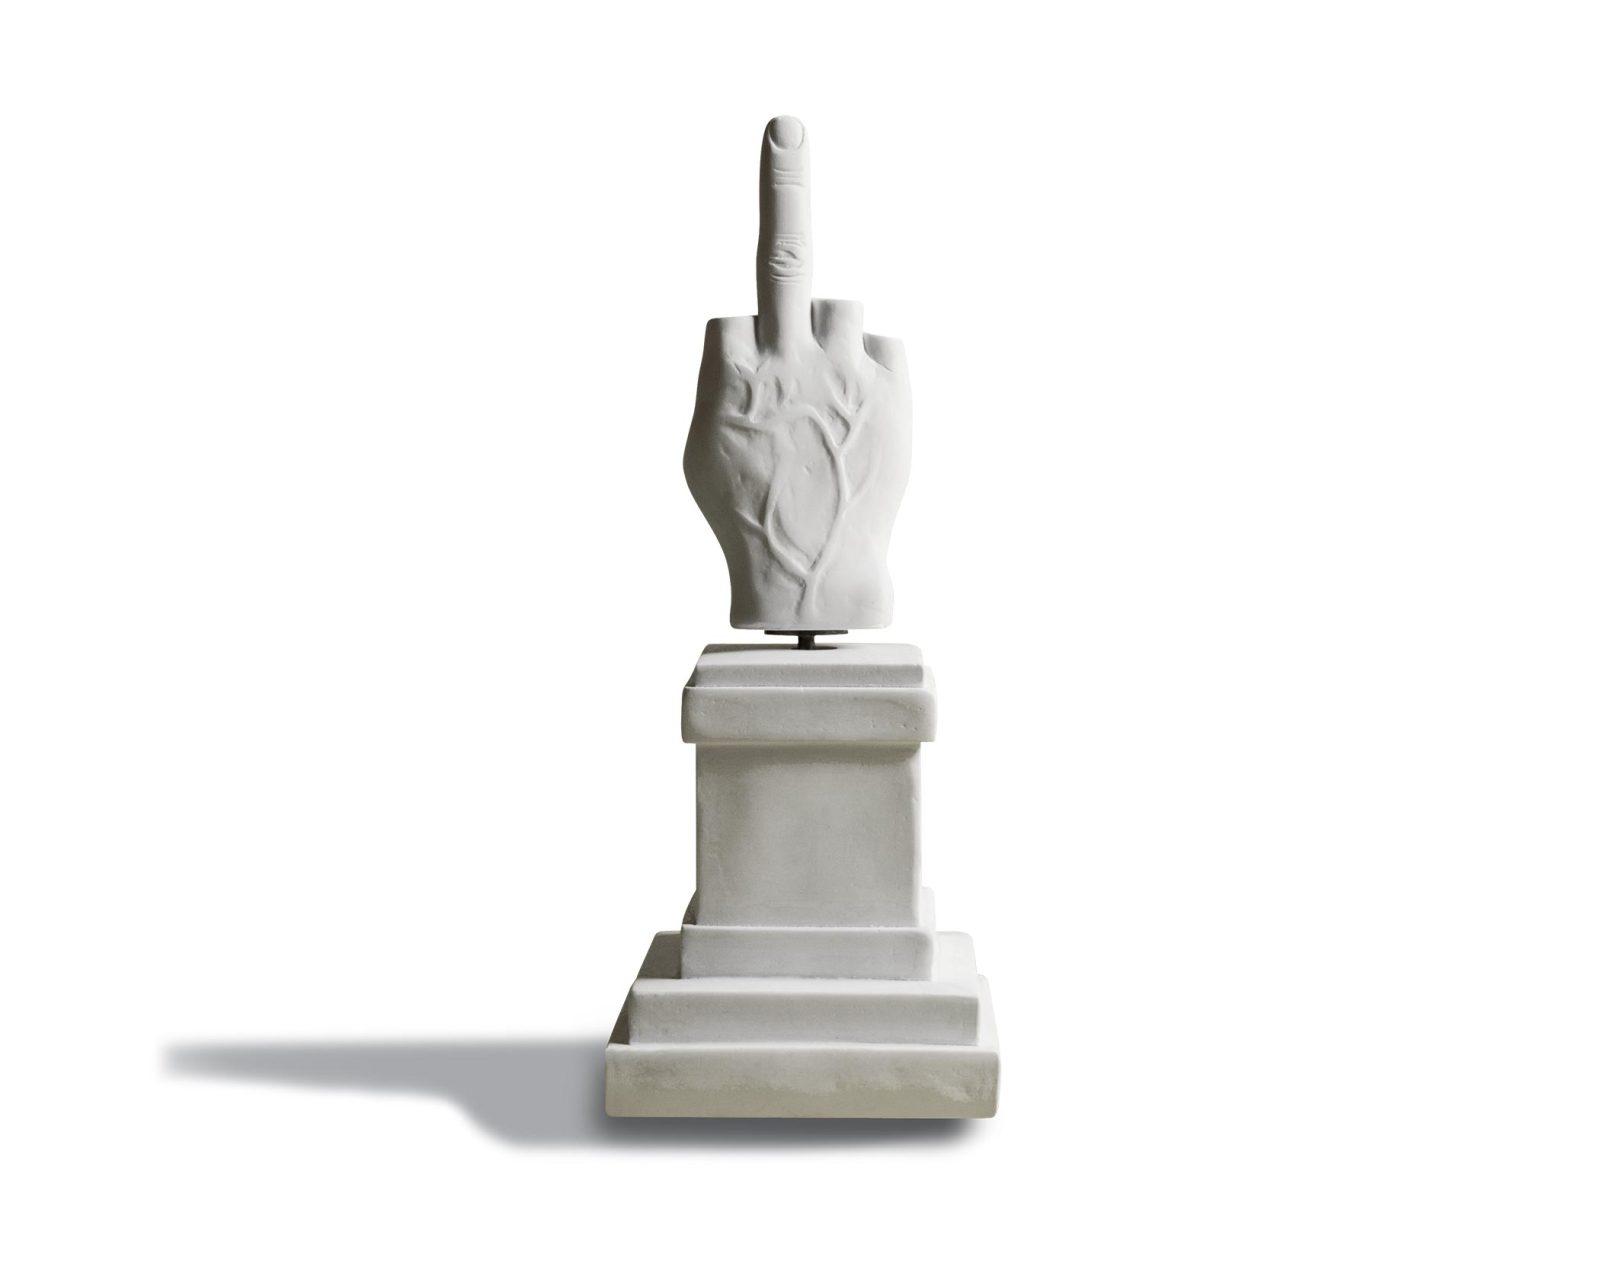 L.O.V.E. Middle Finger Music Box by Seletti-27888